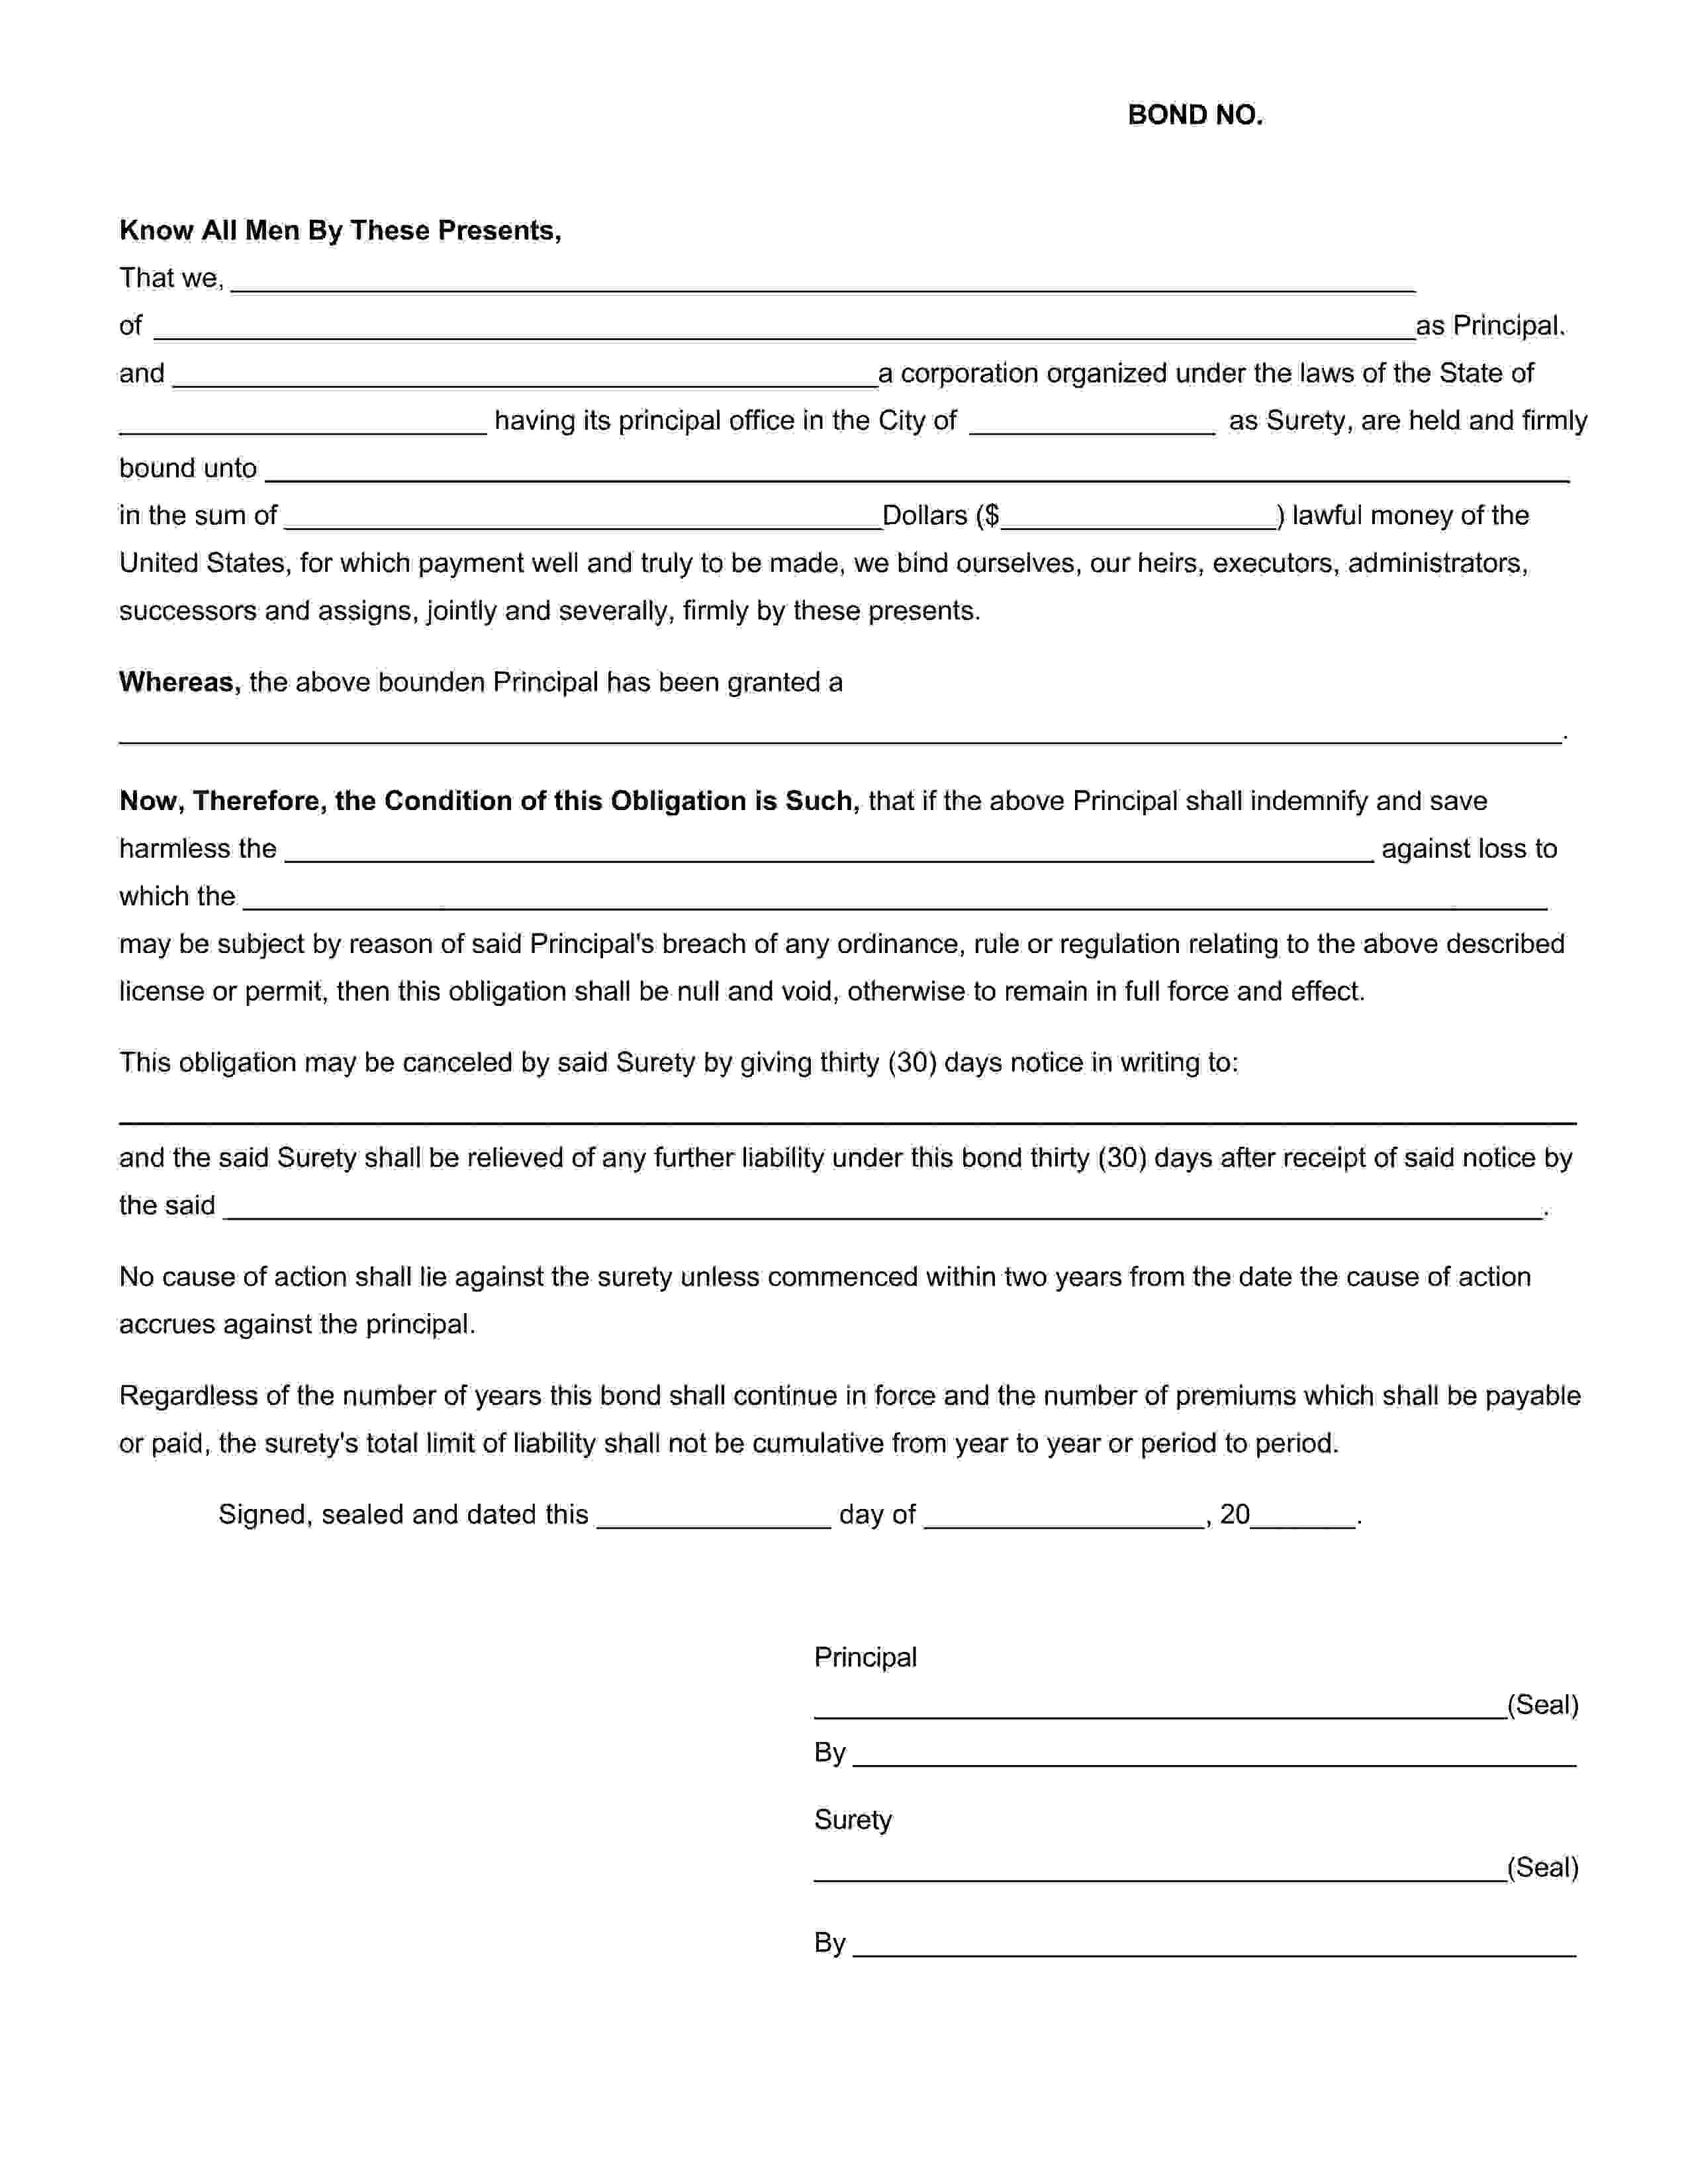 City of Biloxi Biloxi - City License/Permit sample image